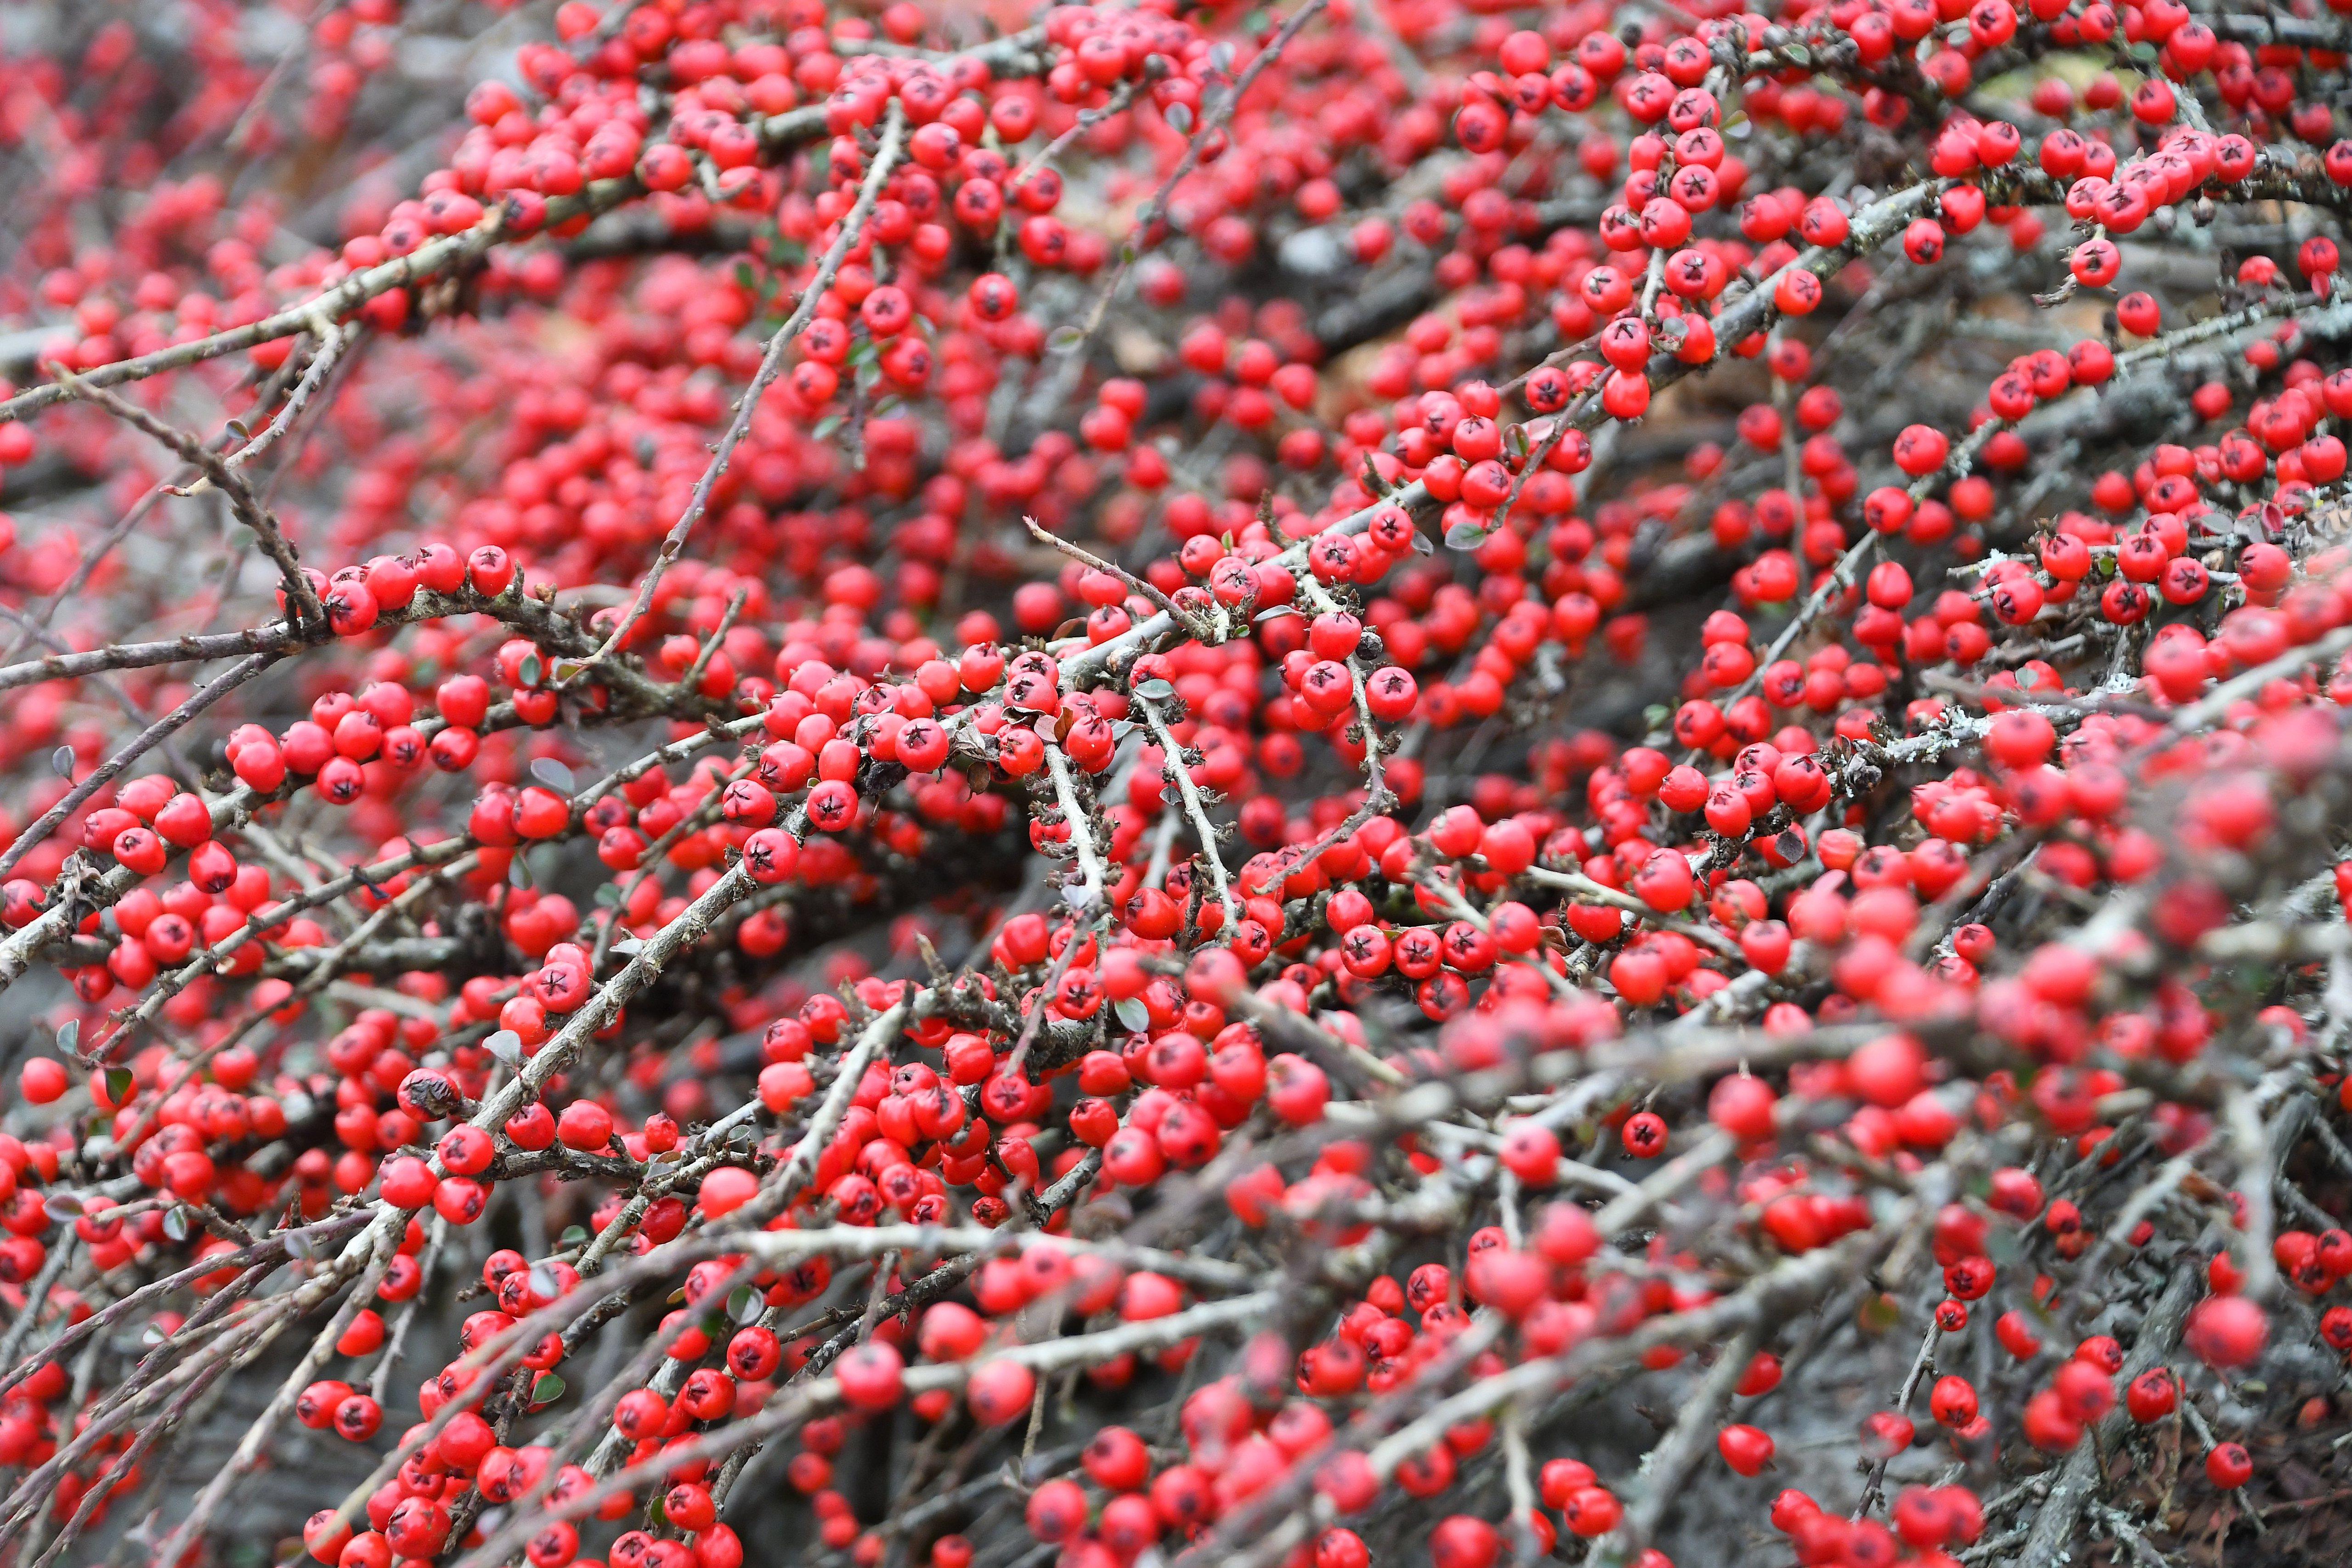 Berries 11.01.2020